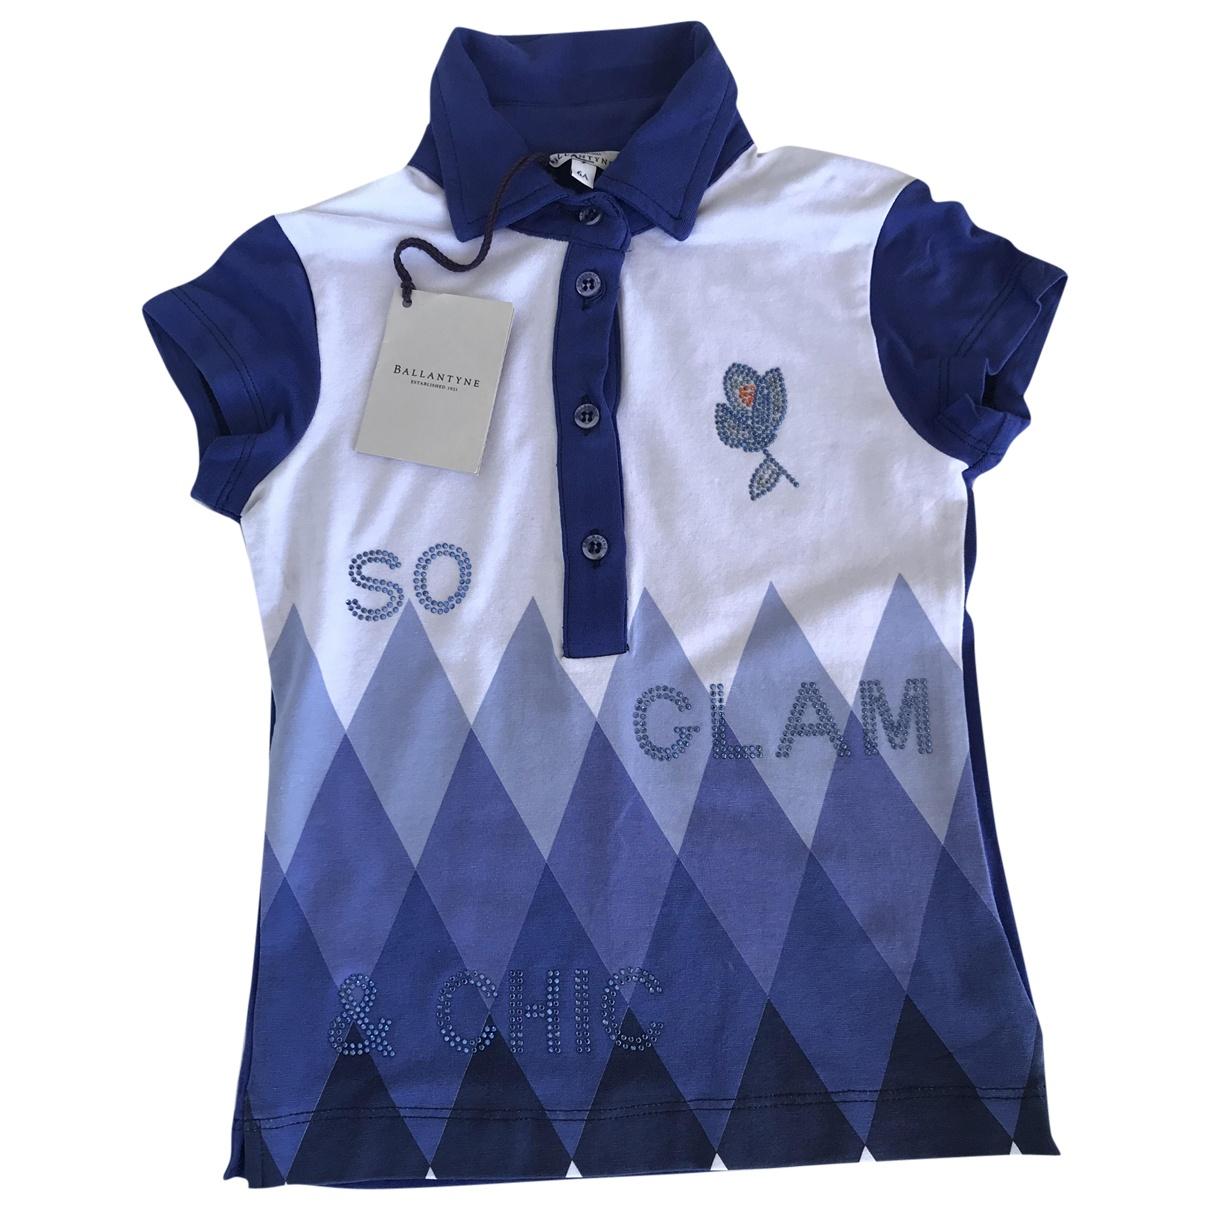 Ballantyne - Top   pour enfant en coton - multicolore